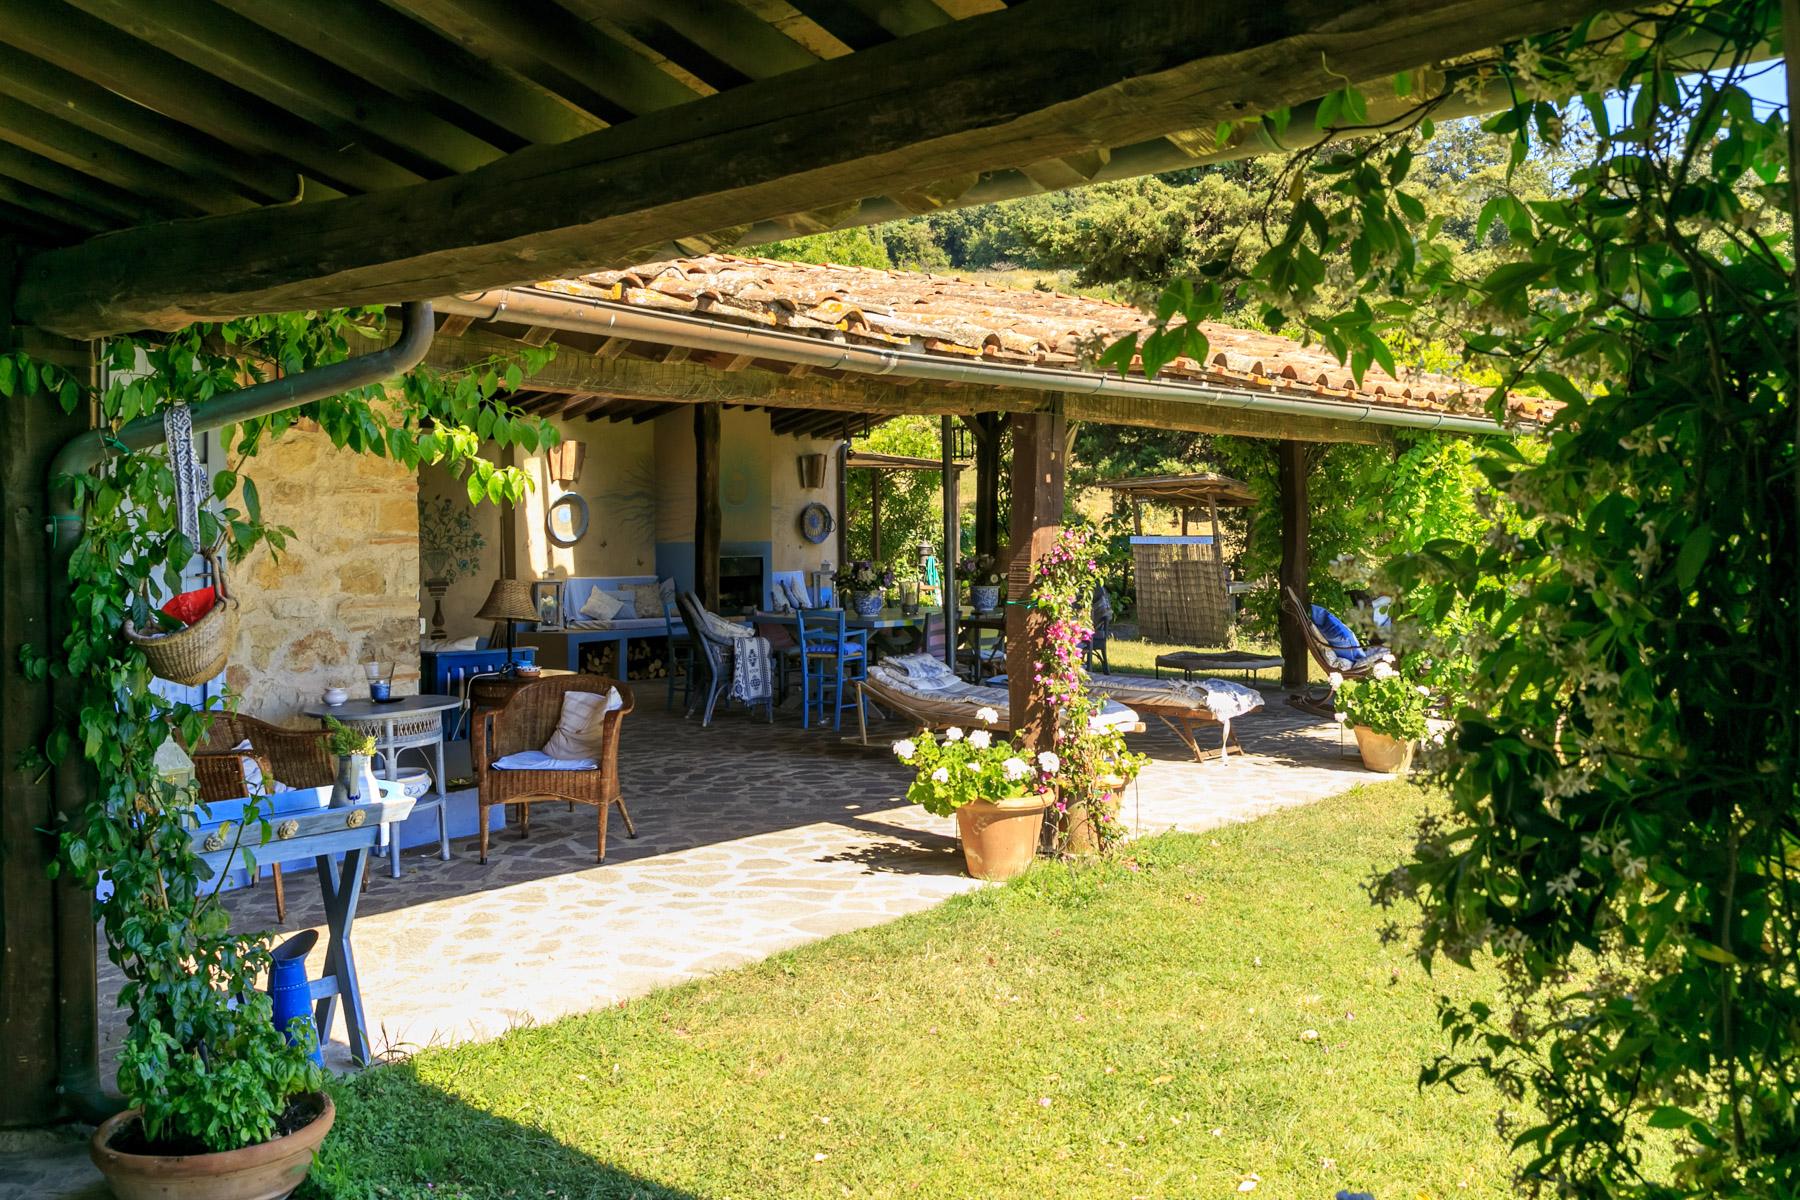 Villa in Vendita a Santa Luce: 5 locali, 270 mq - Foto 10